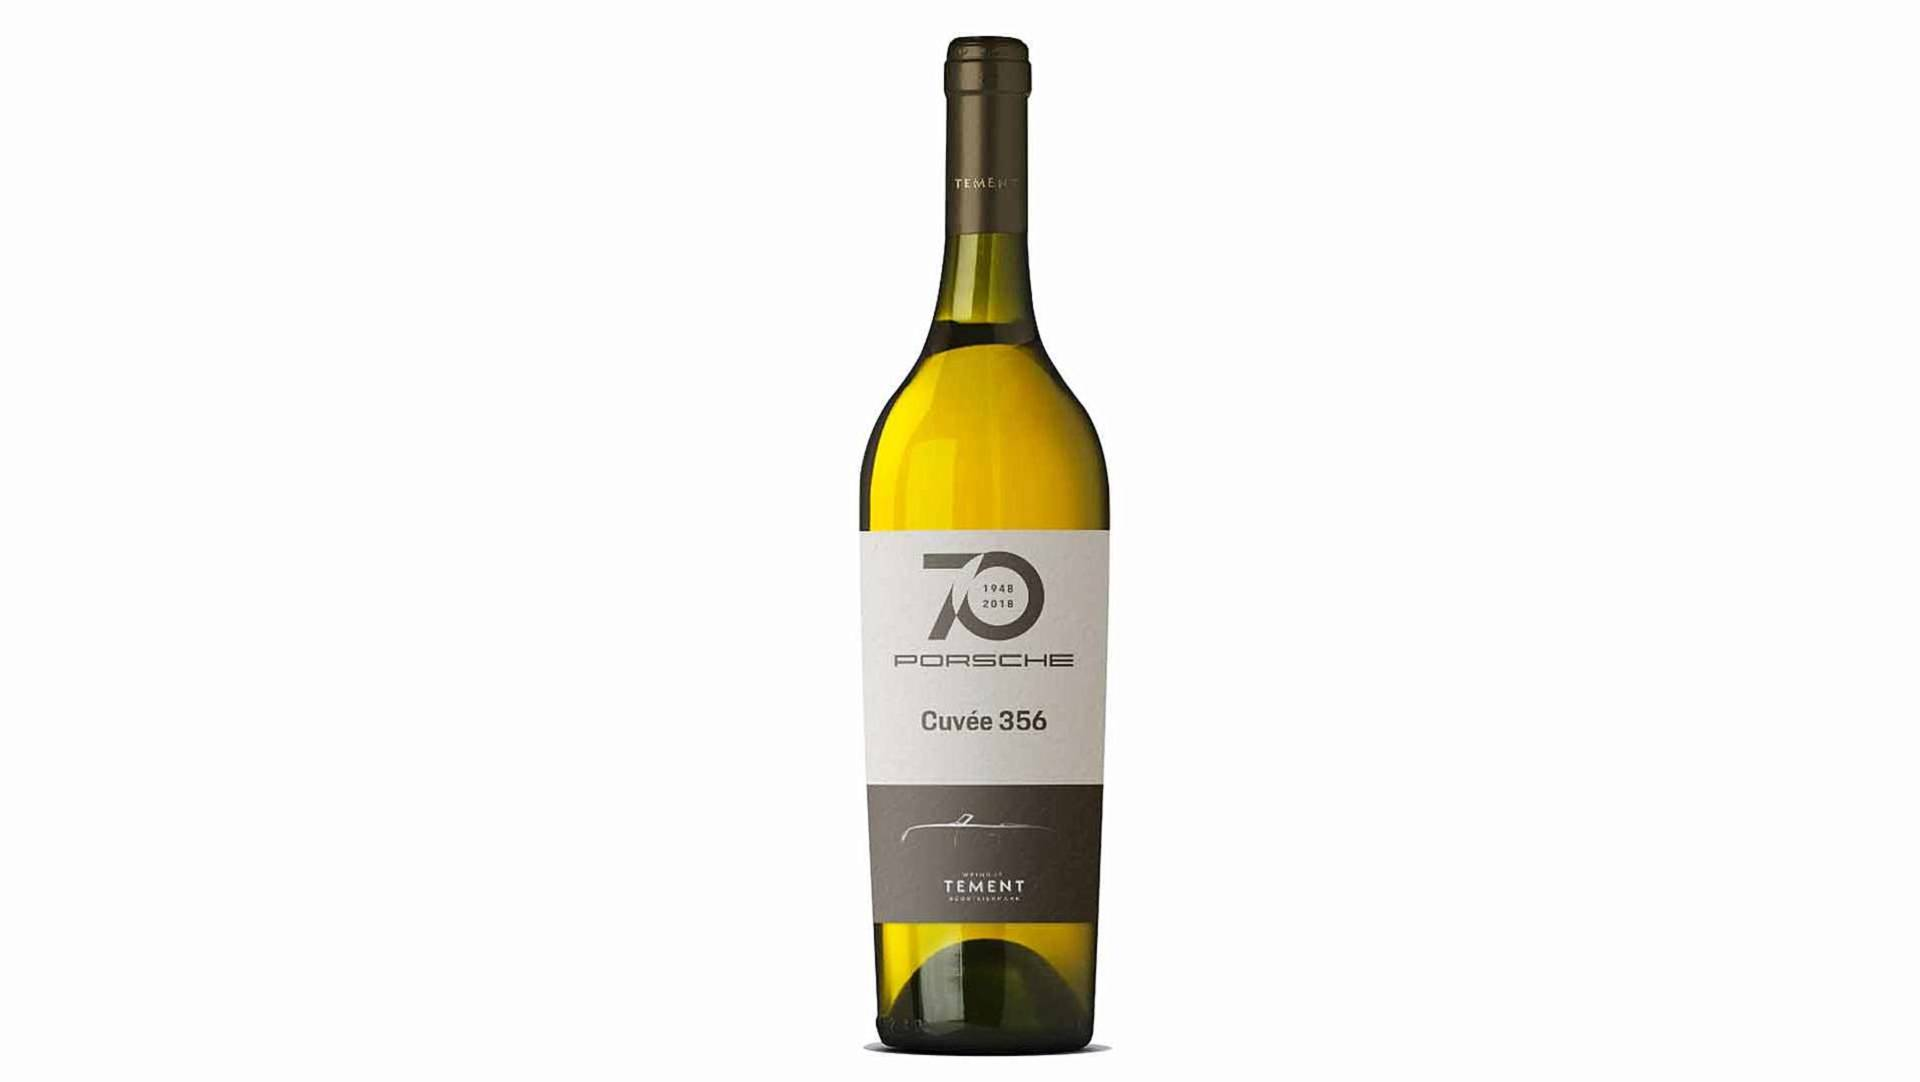 porsche-cuvee-356-wine